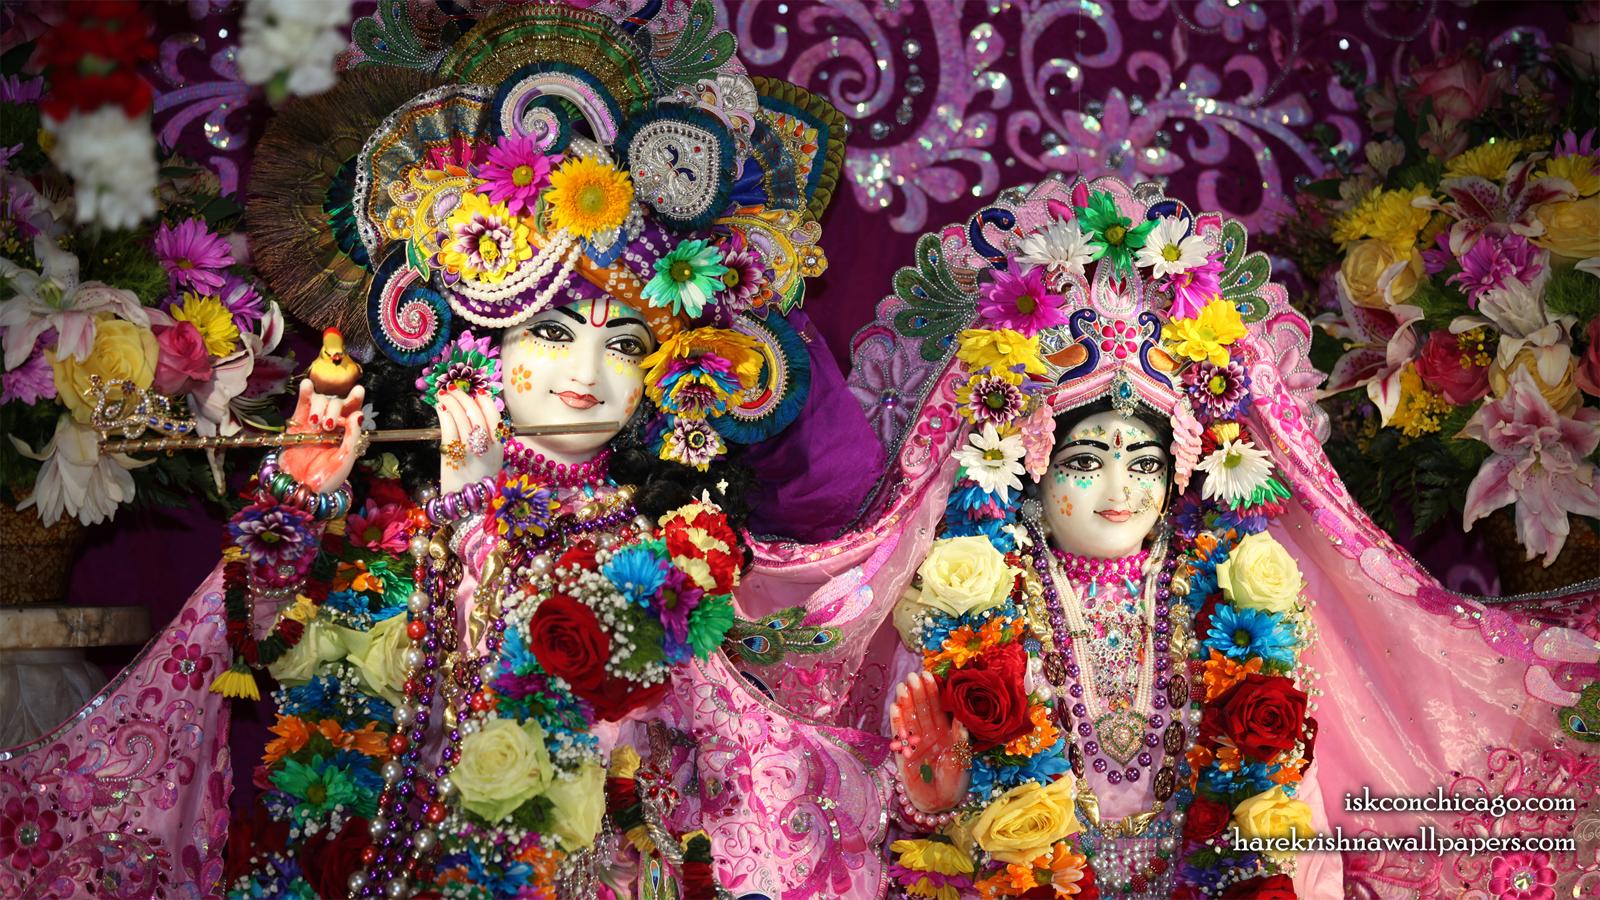 Sri Sri Kishore Kishori Close up Wallpaper (017) Size 1600x900 Download